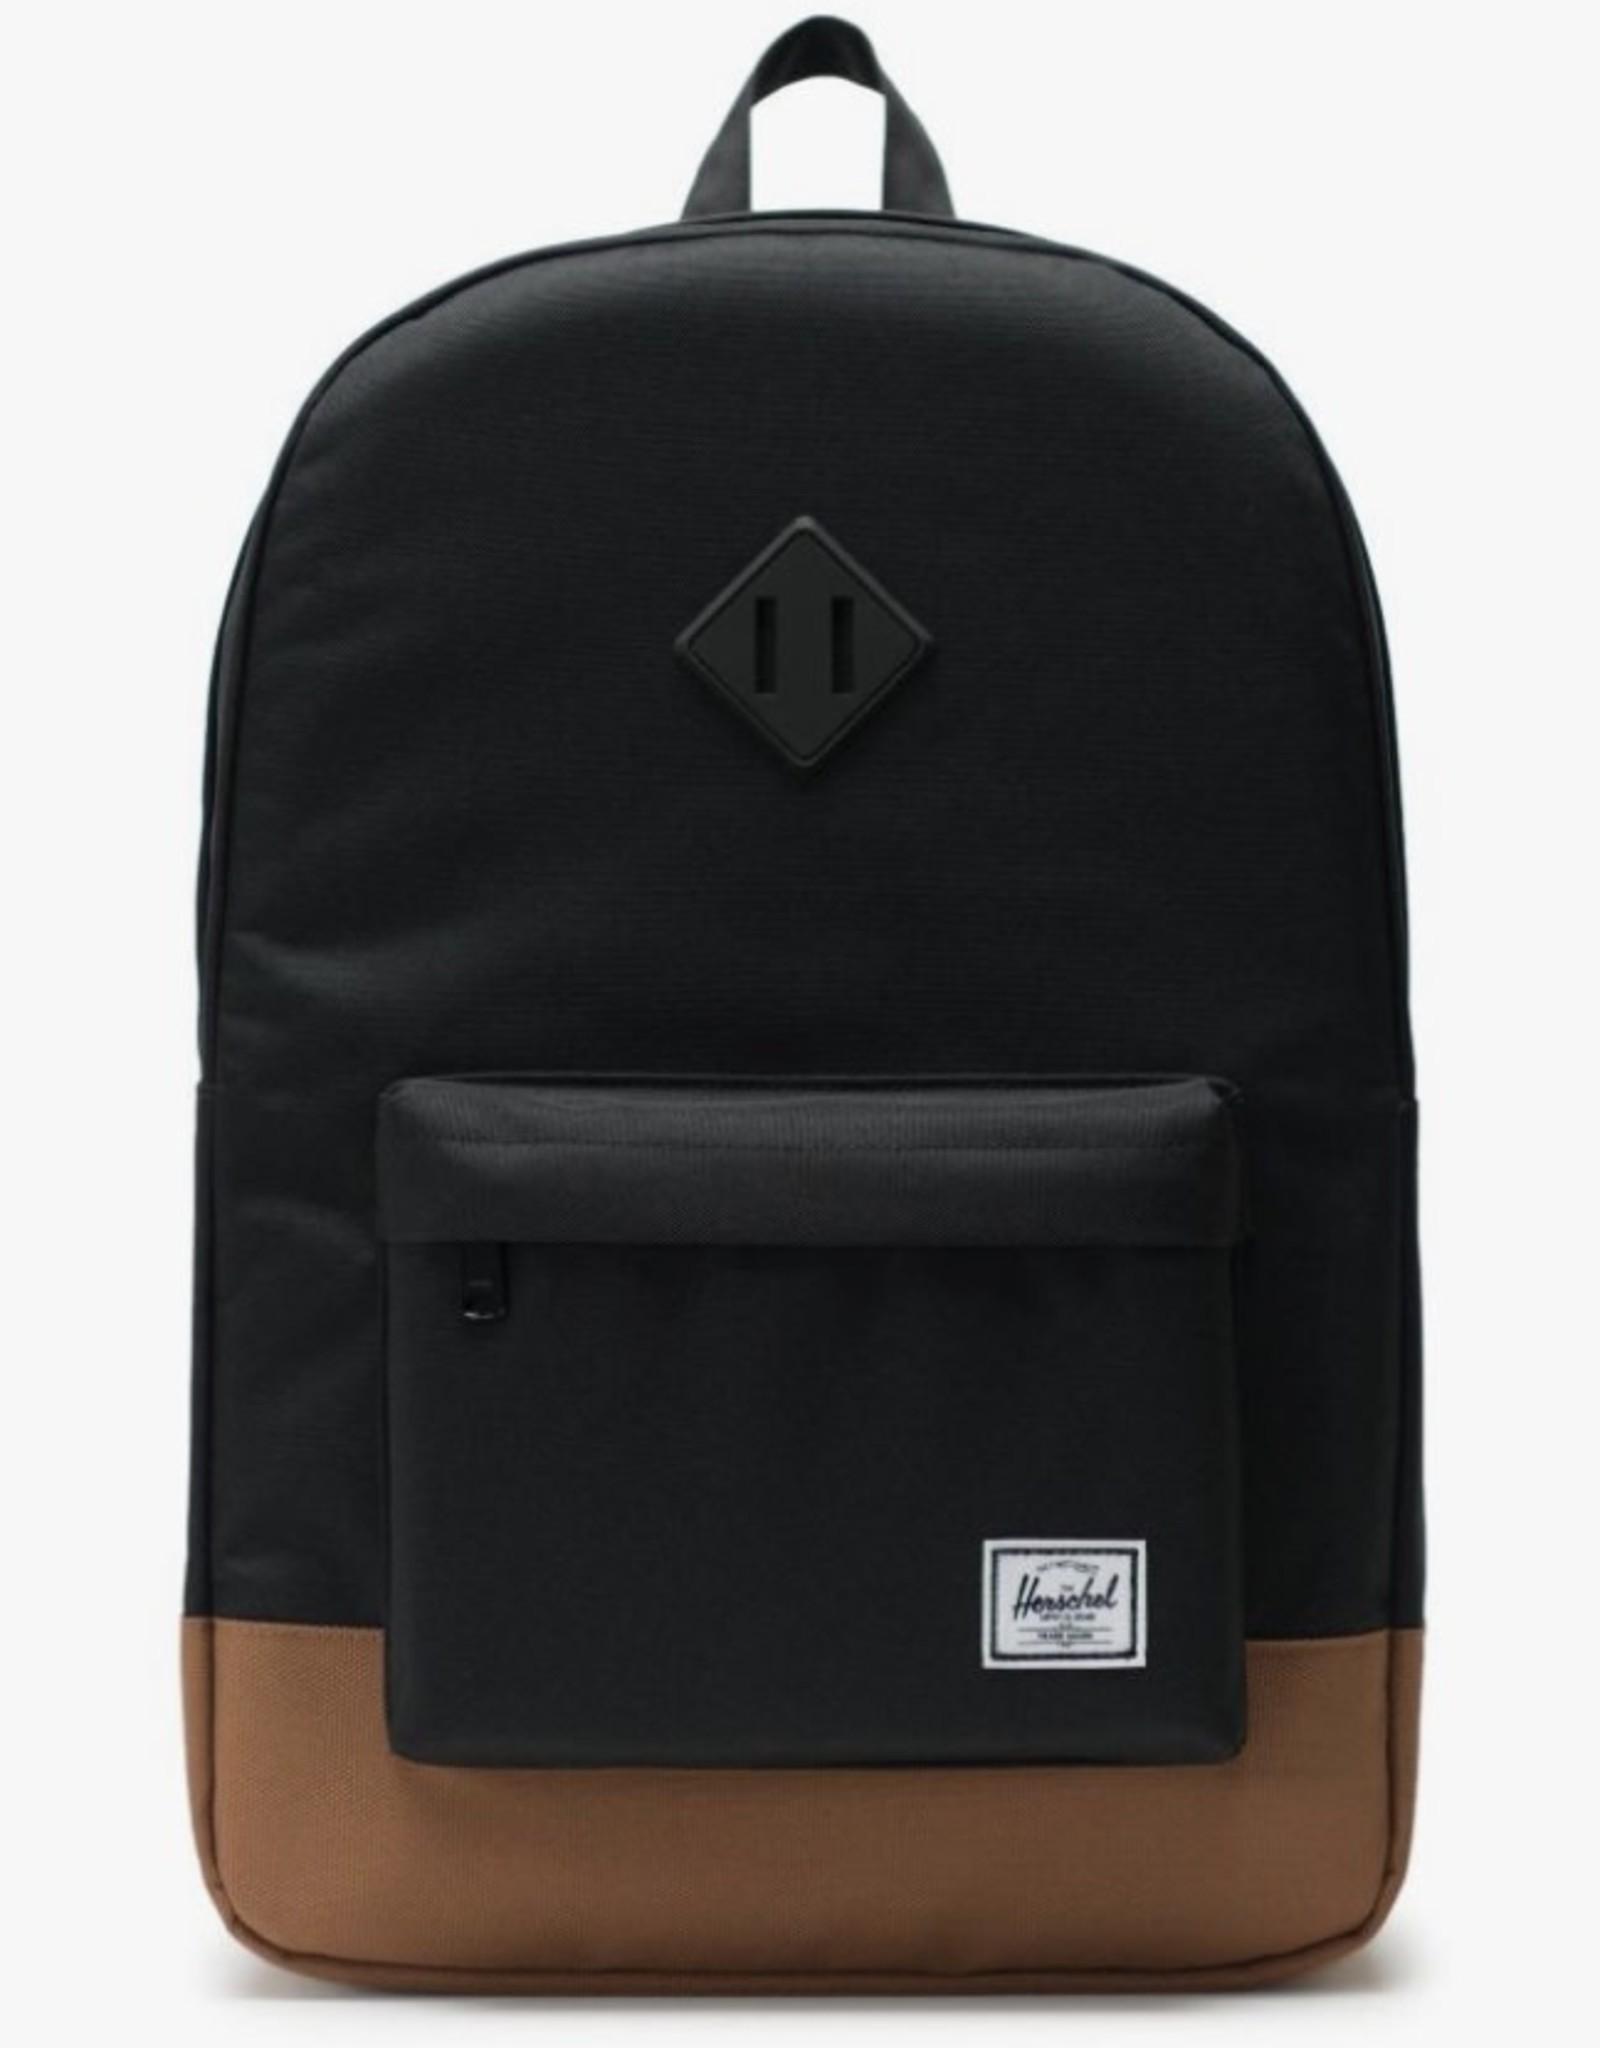 Herschel Heritage Black/Saddle Brown